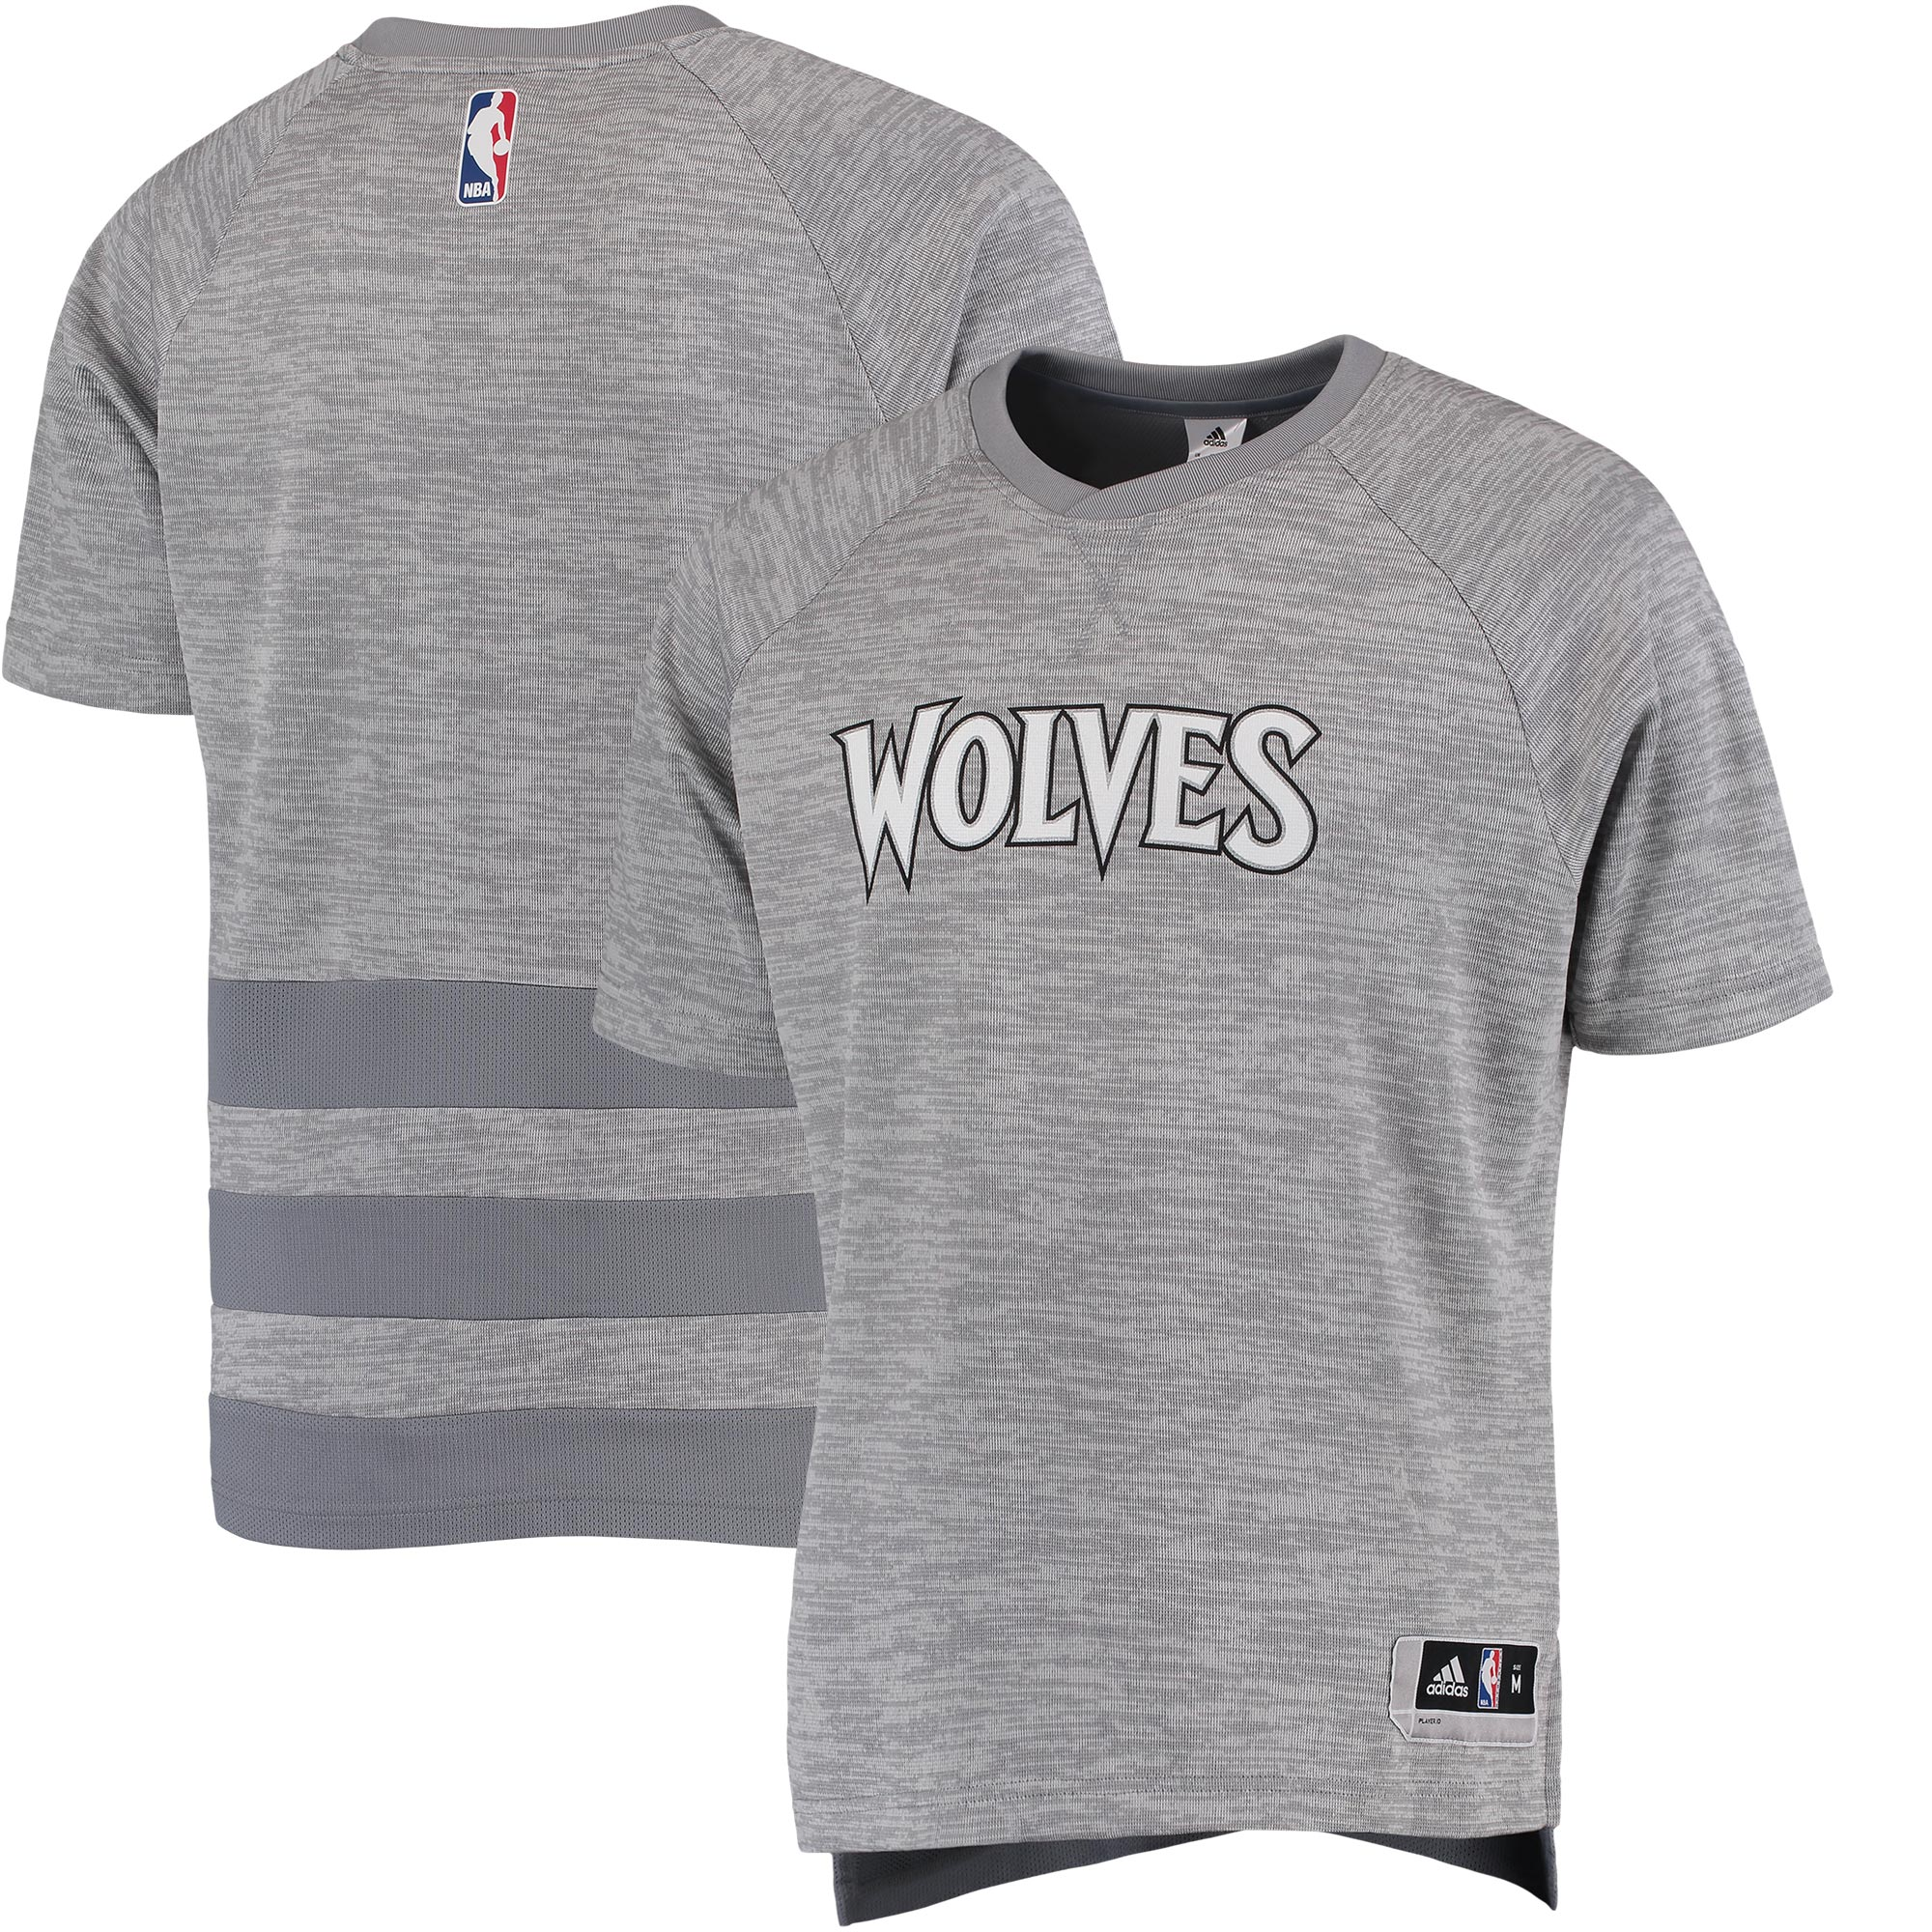 Minnesota Timberwolves adidas 2016 On-Court Shooter T-Shirt - Gray